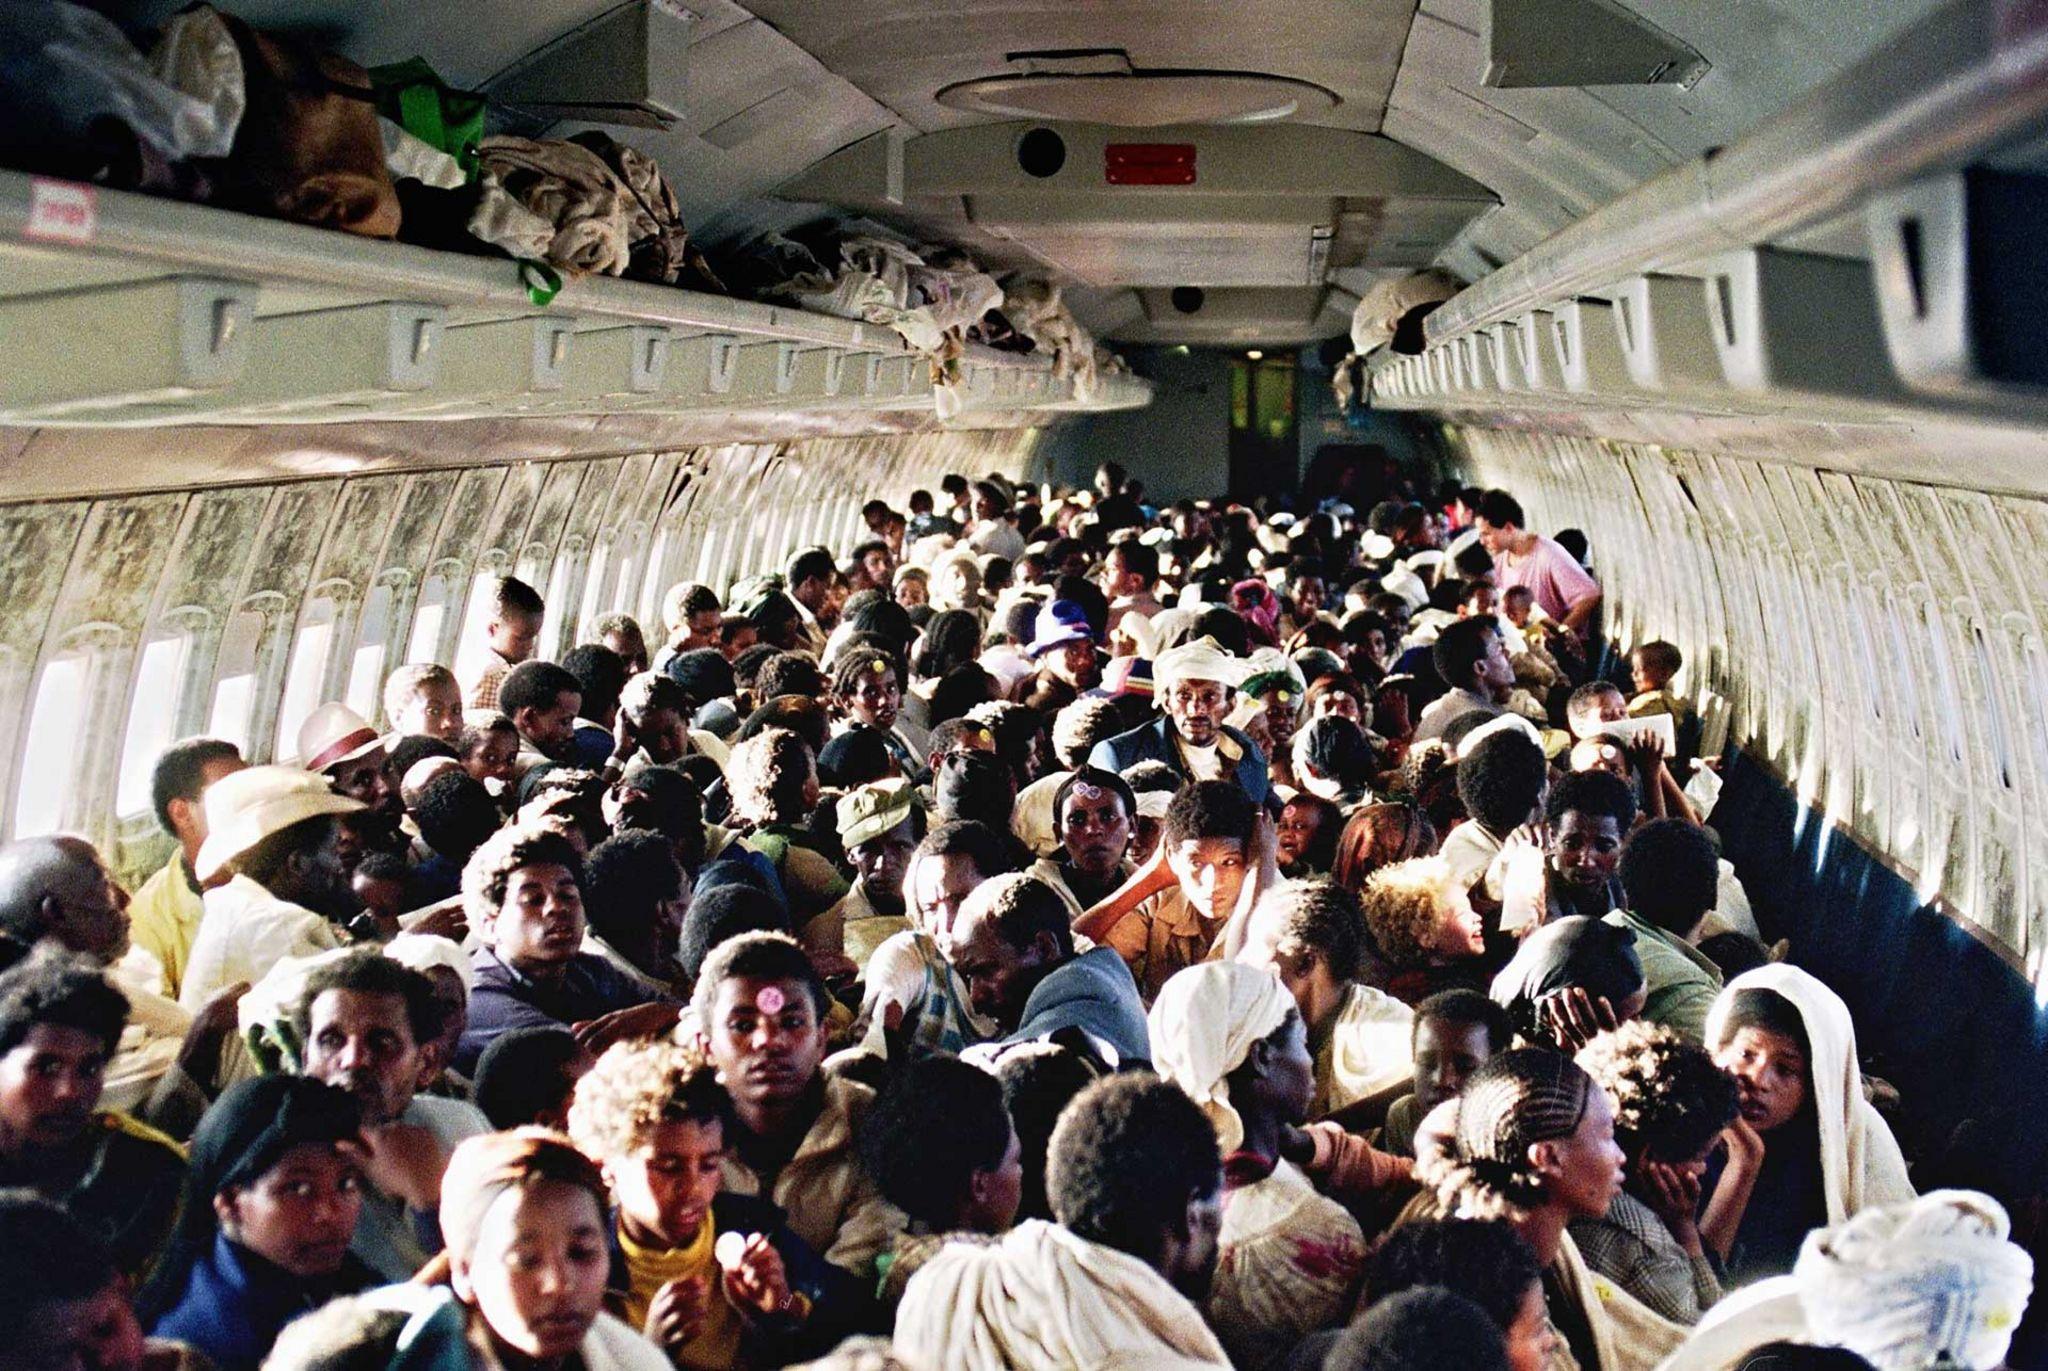 Ethiopian Jews on board a Boeing 707